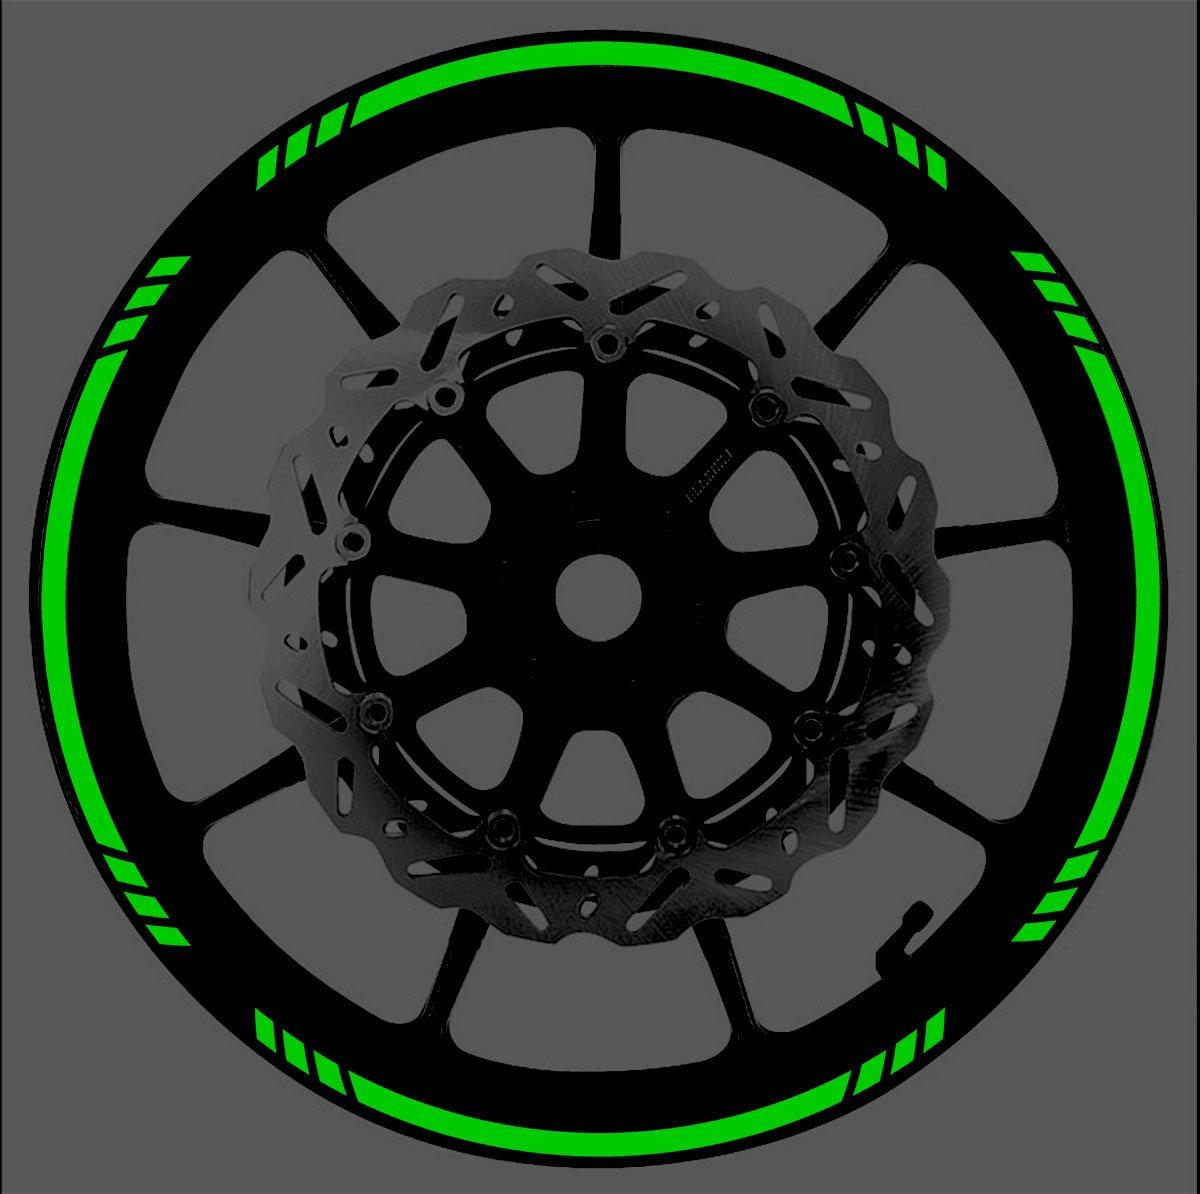 Vehicleartz DARK GREEN Reflective Speed Graduated Wheel Rim Tape Stripe fit Motorcycles, Cars, Trucks